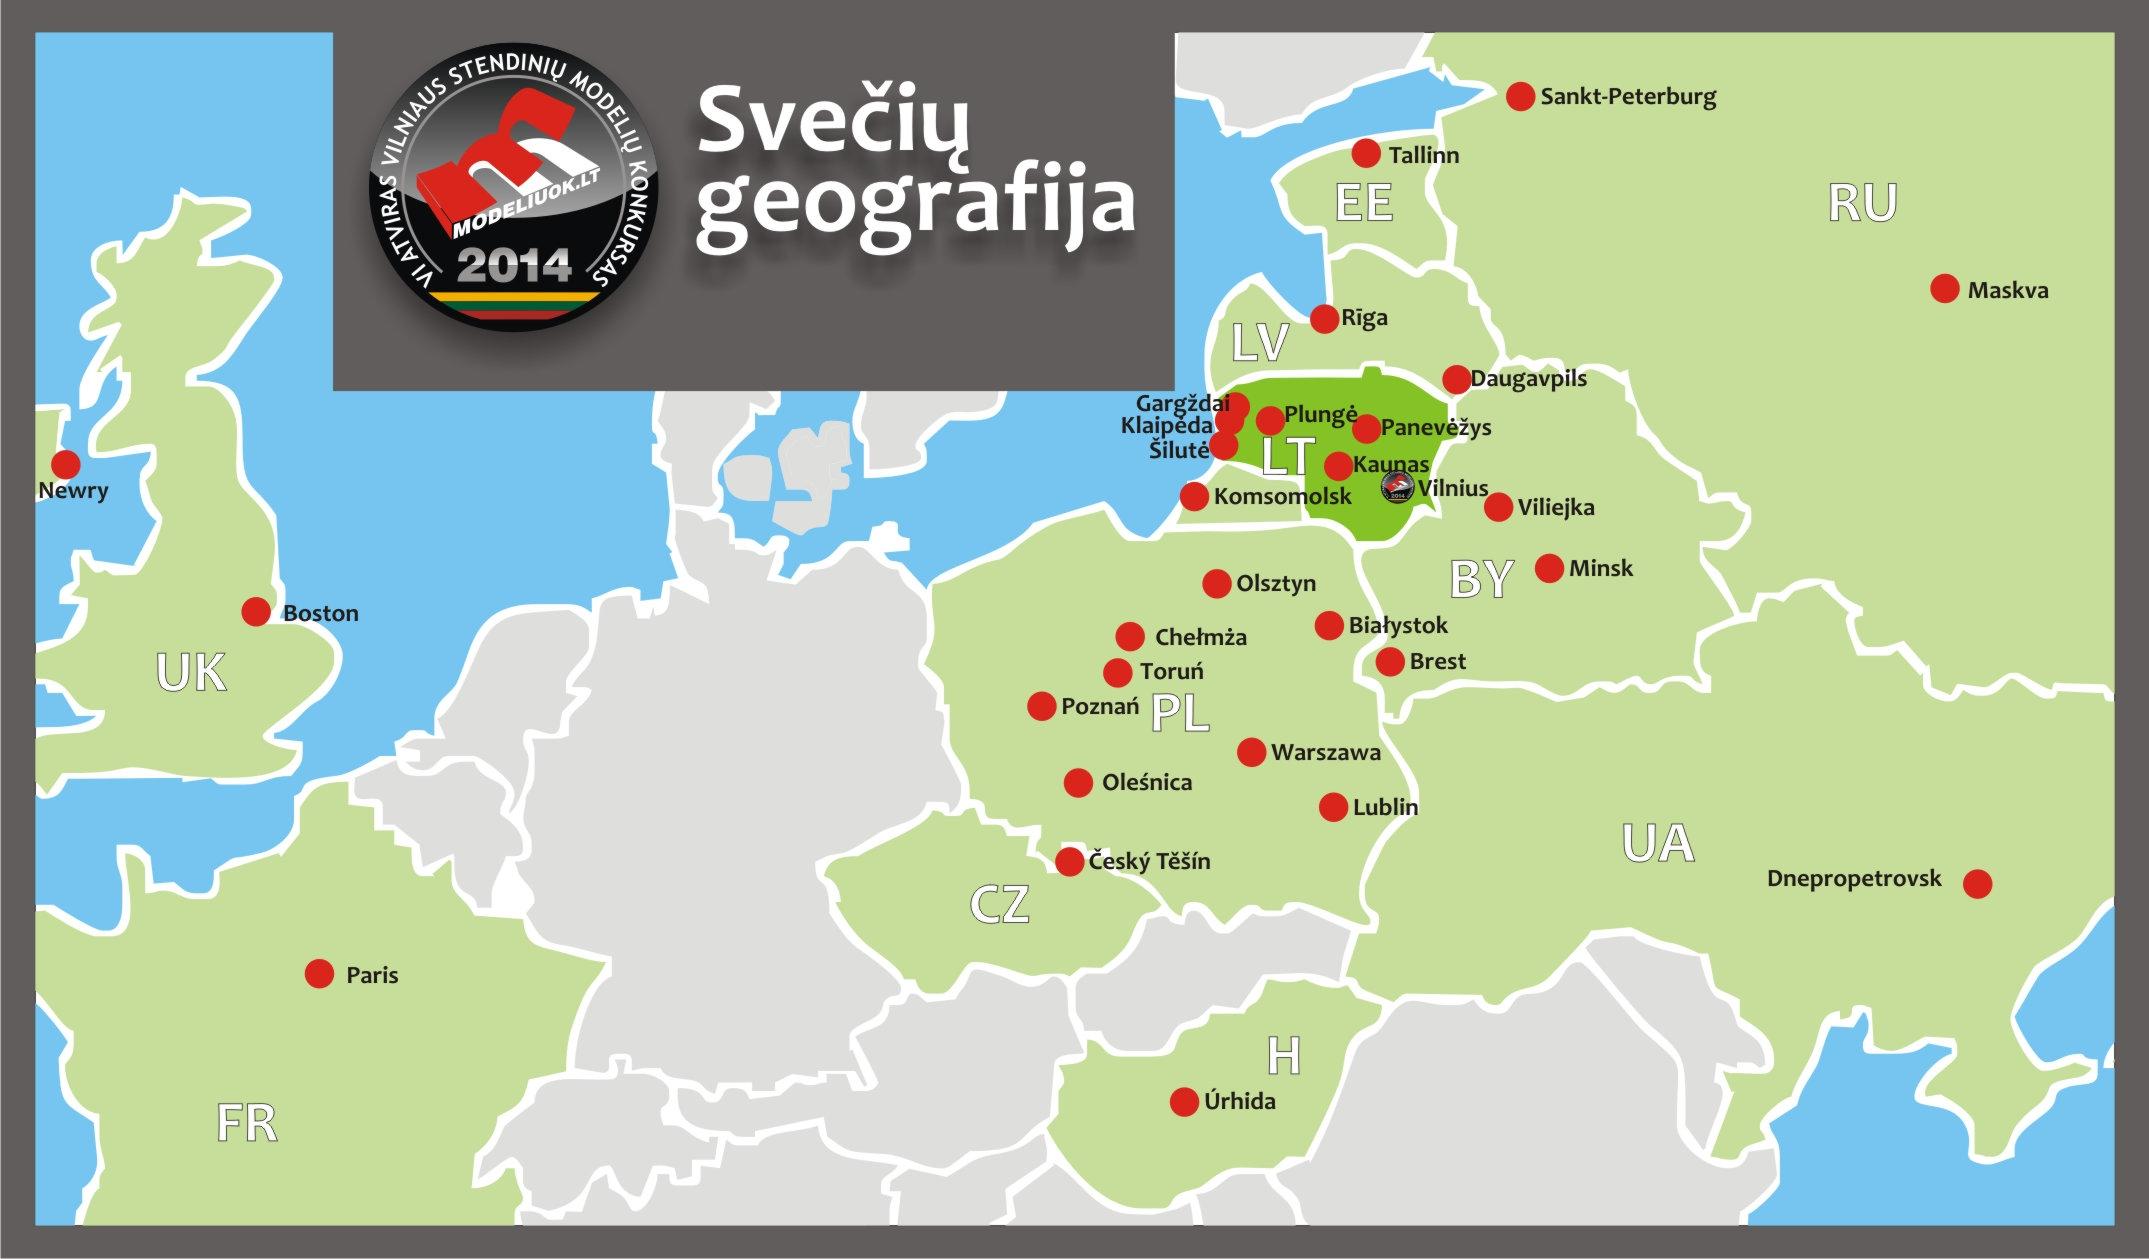 dalyviu geografija 2014 2